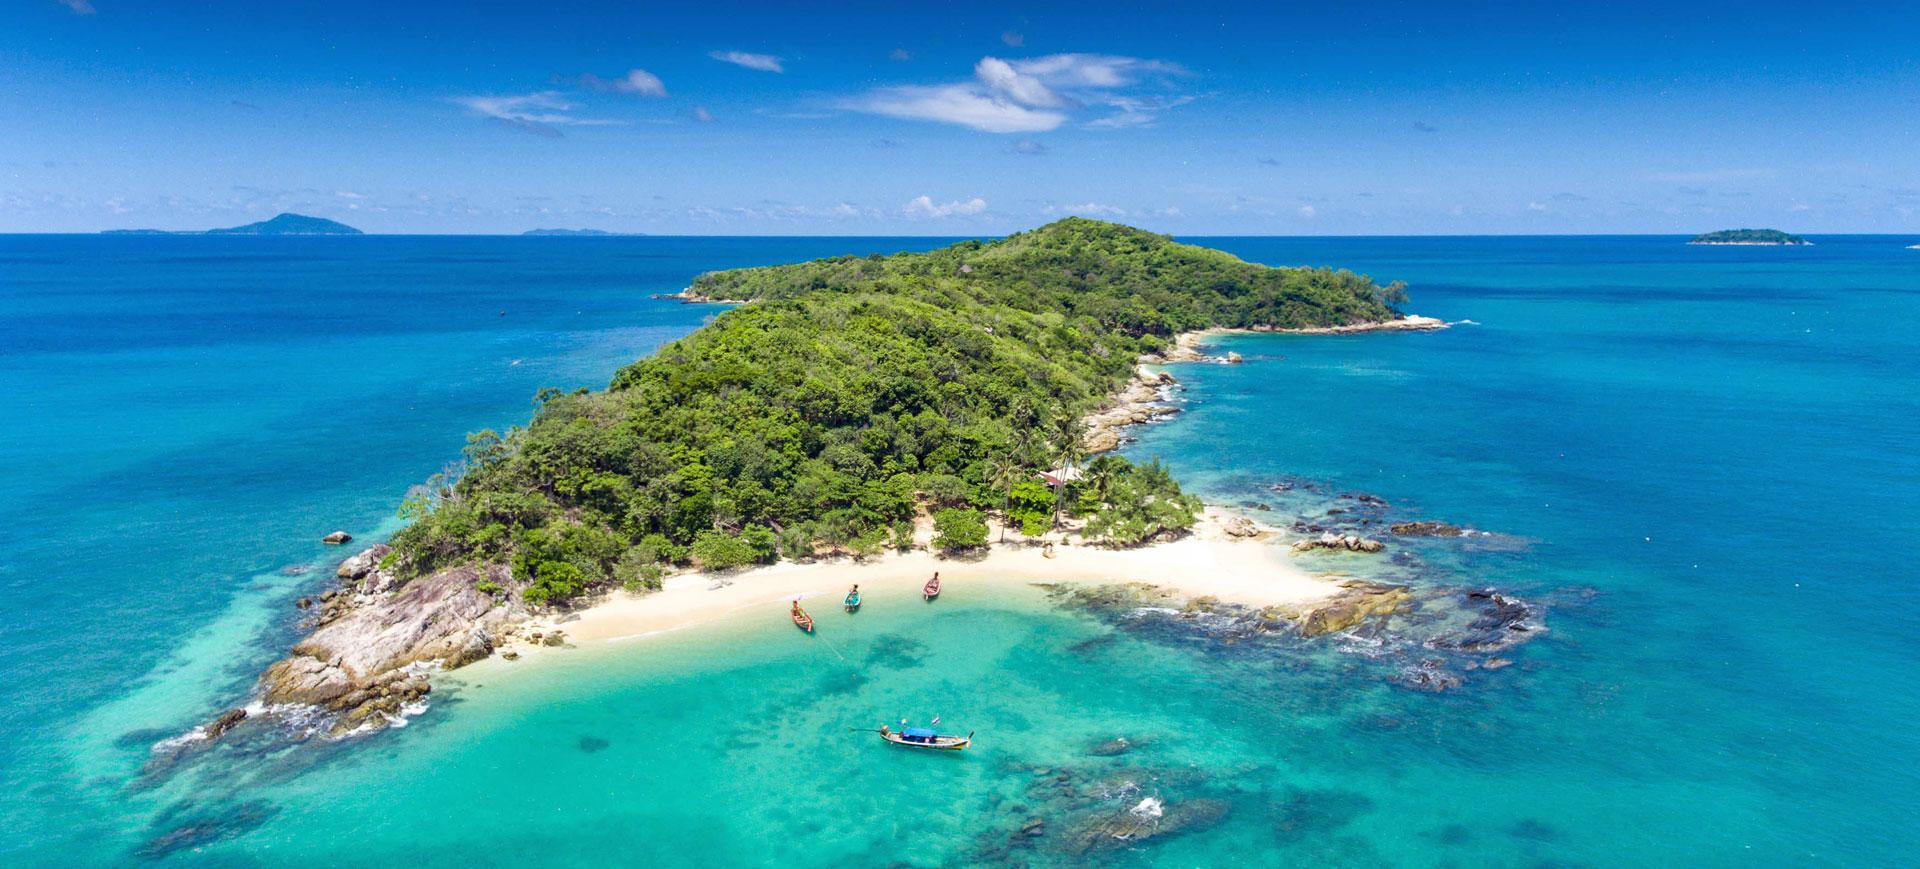 Bon Island, Ayurveda, Wellness, Yoga Retreats, Phuket Thailand, Mangosteen Ayurveda & Wellness Resort, Number 1 Ayurveda Resort in Thailand, Rawai, Phuket.